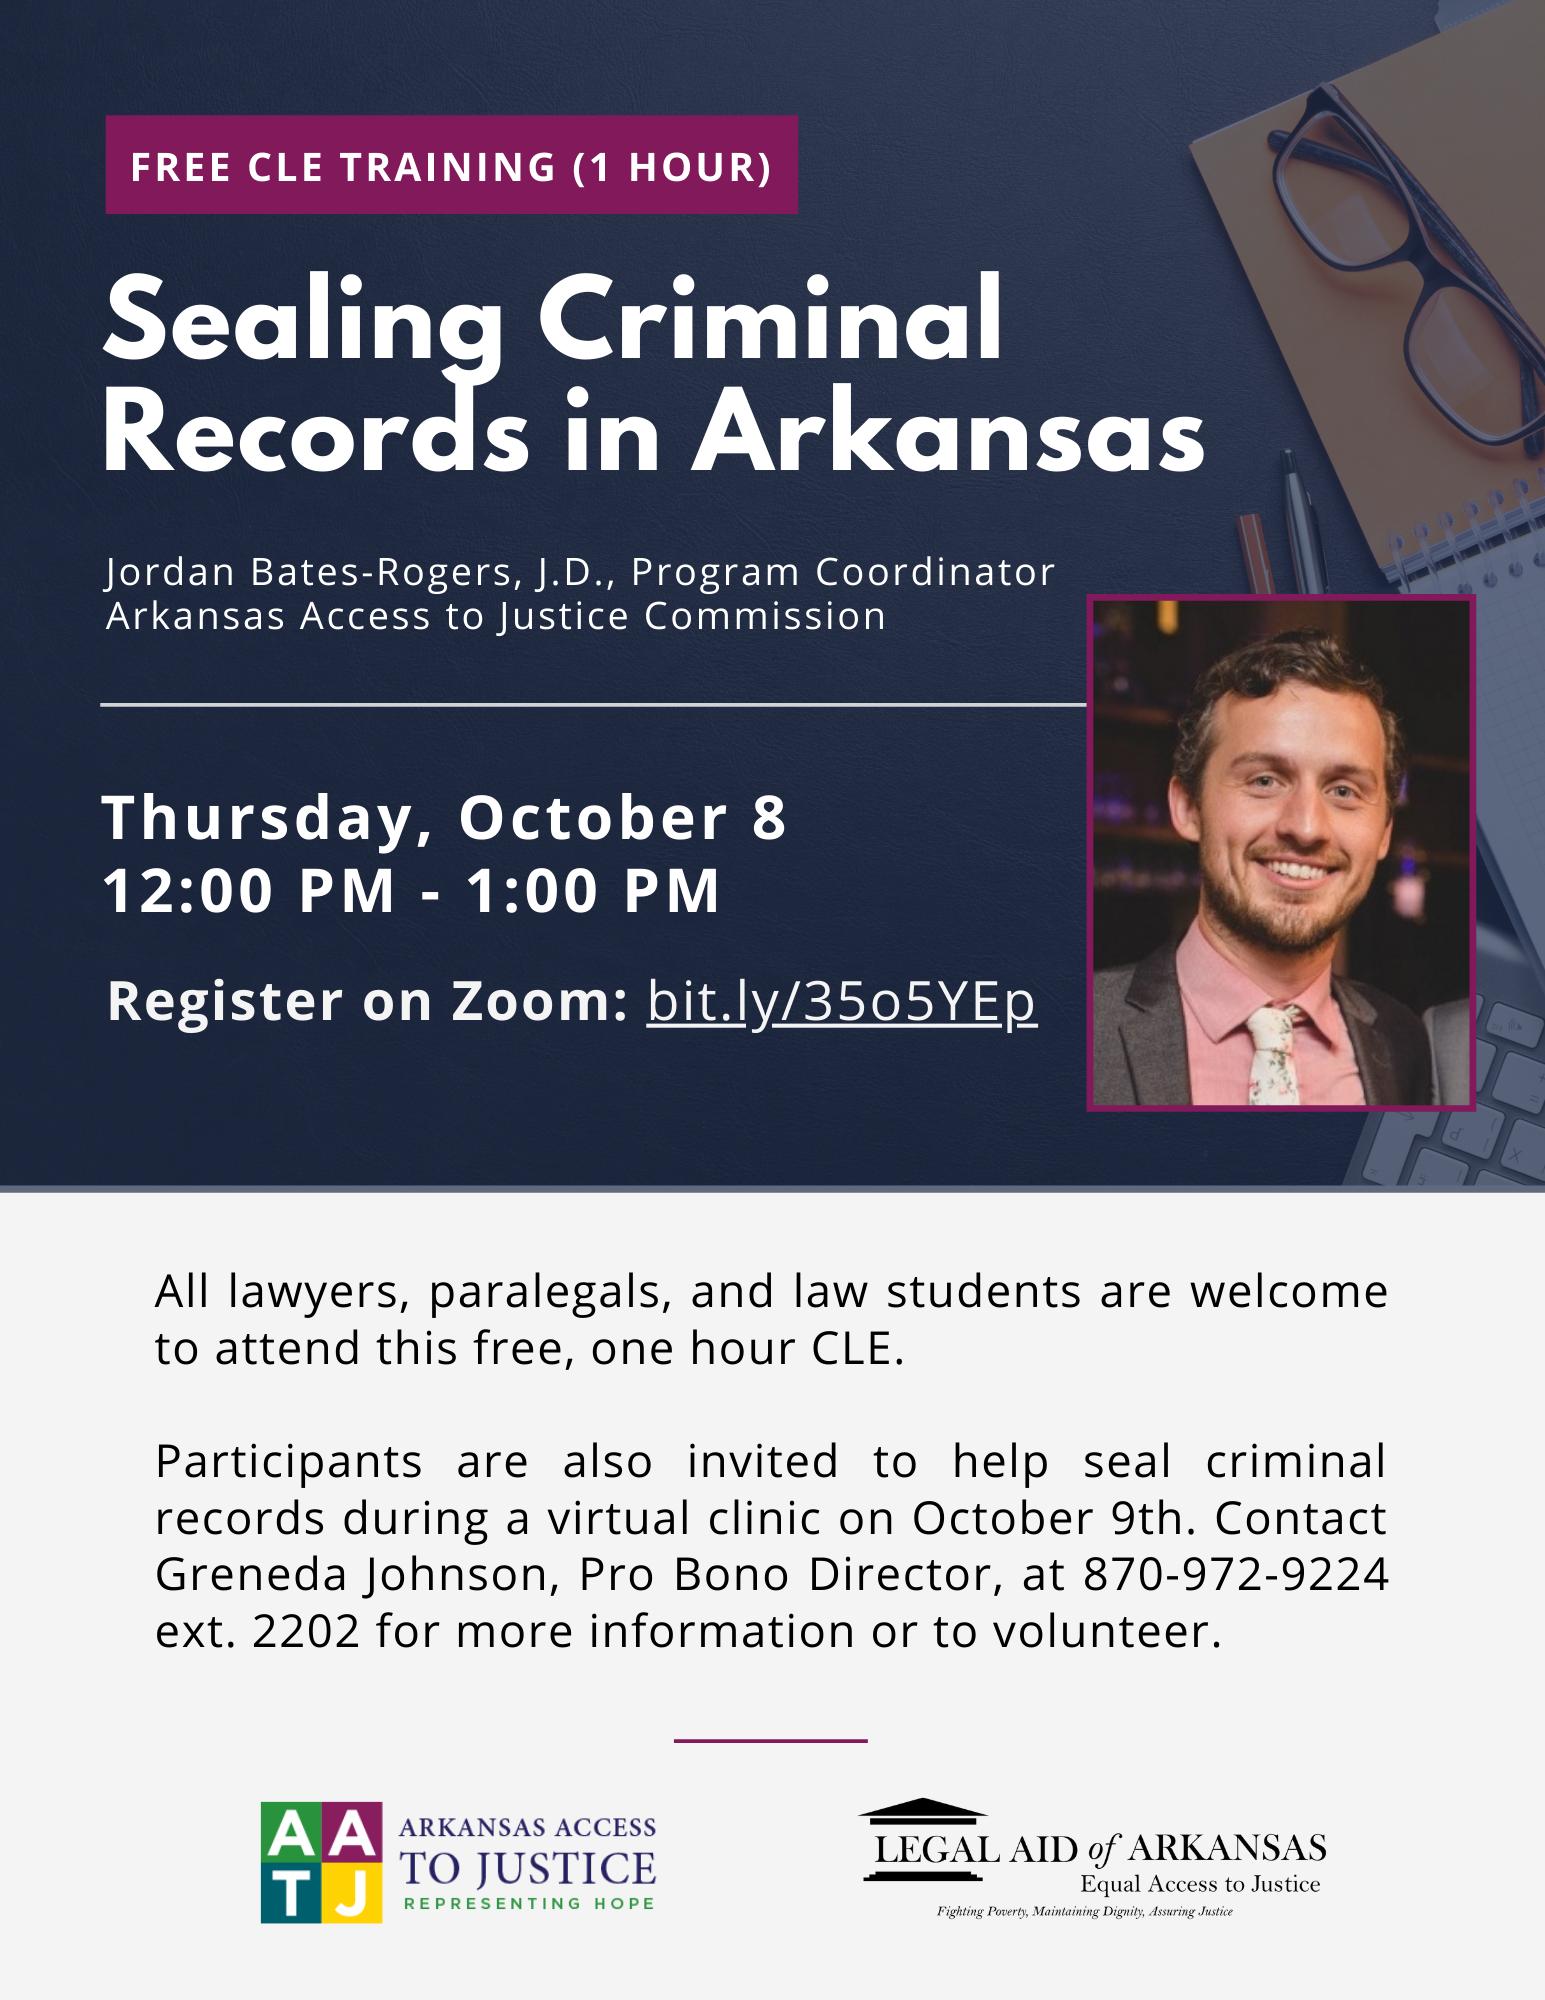 Sealing Criminal Records in Arkansas (1.0 CLE)